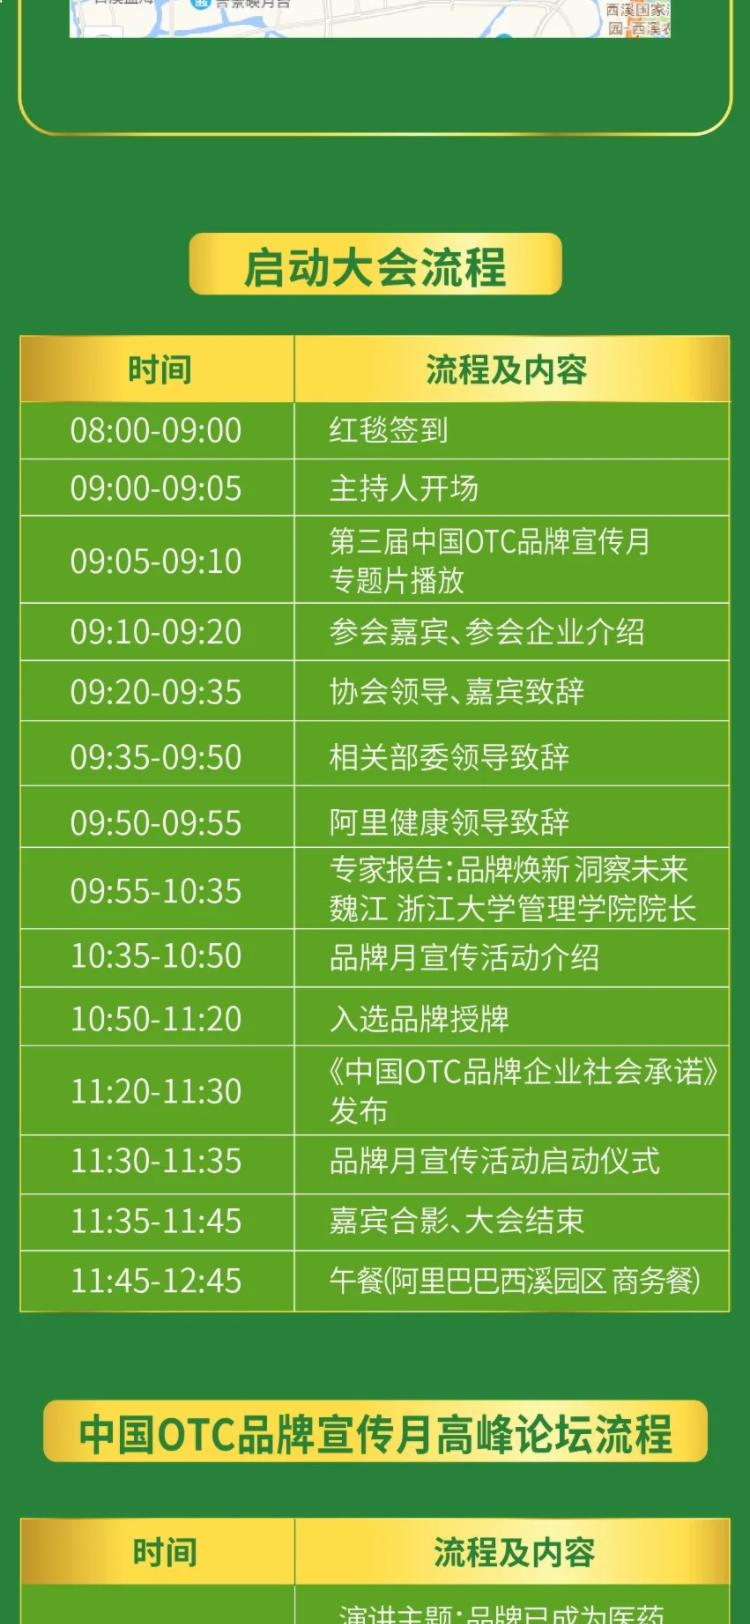 WeChat Image_20200819162526.png